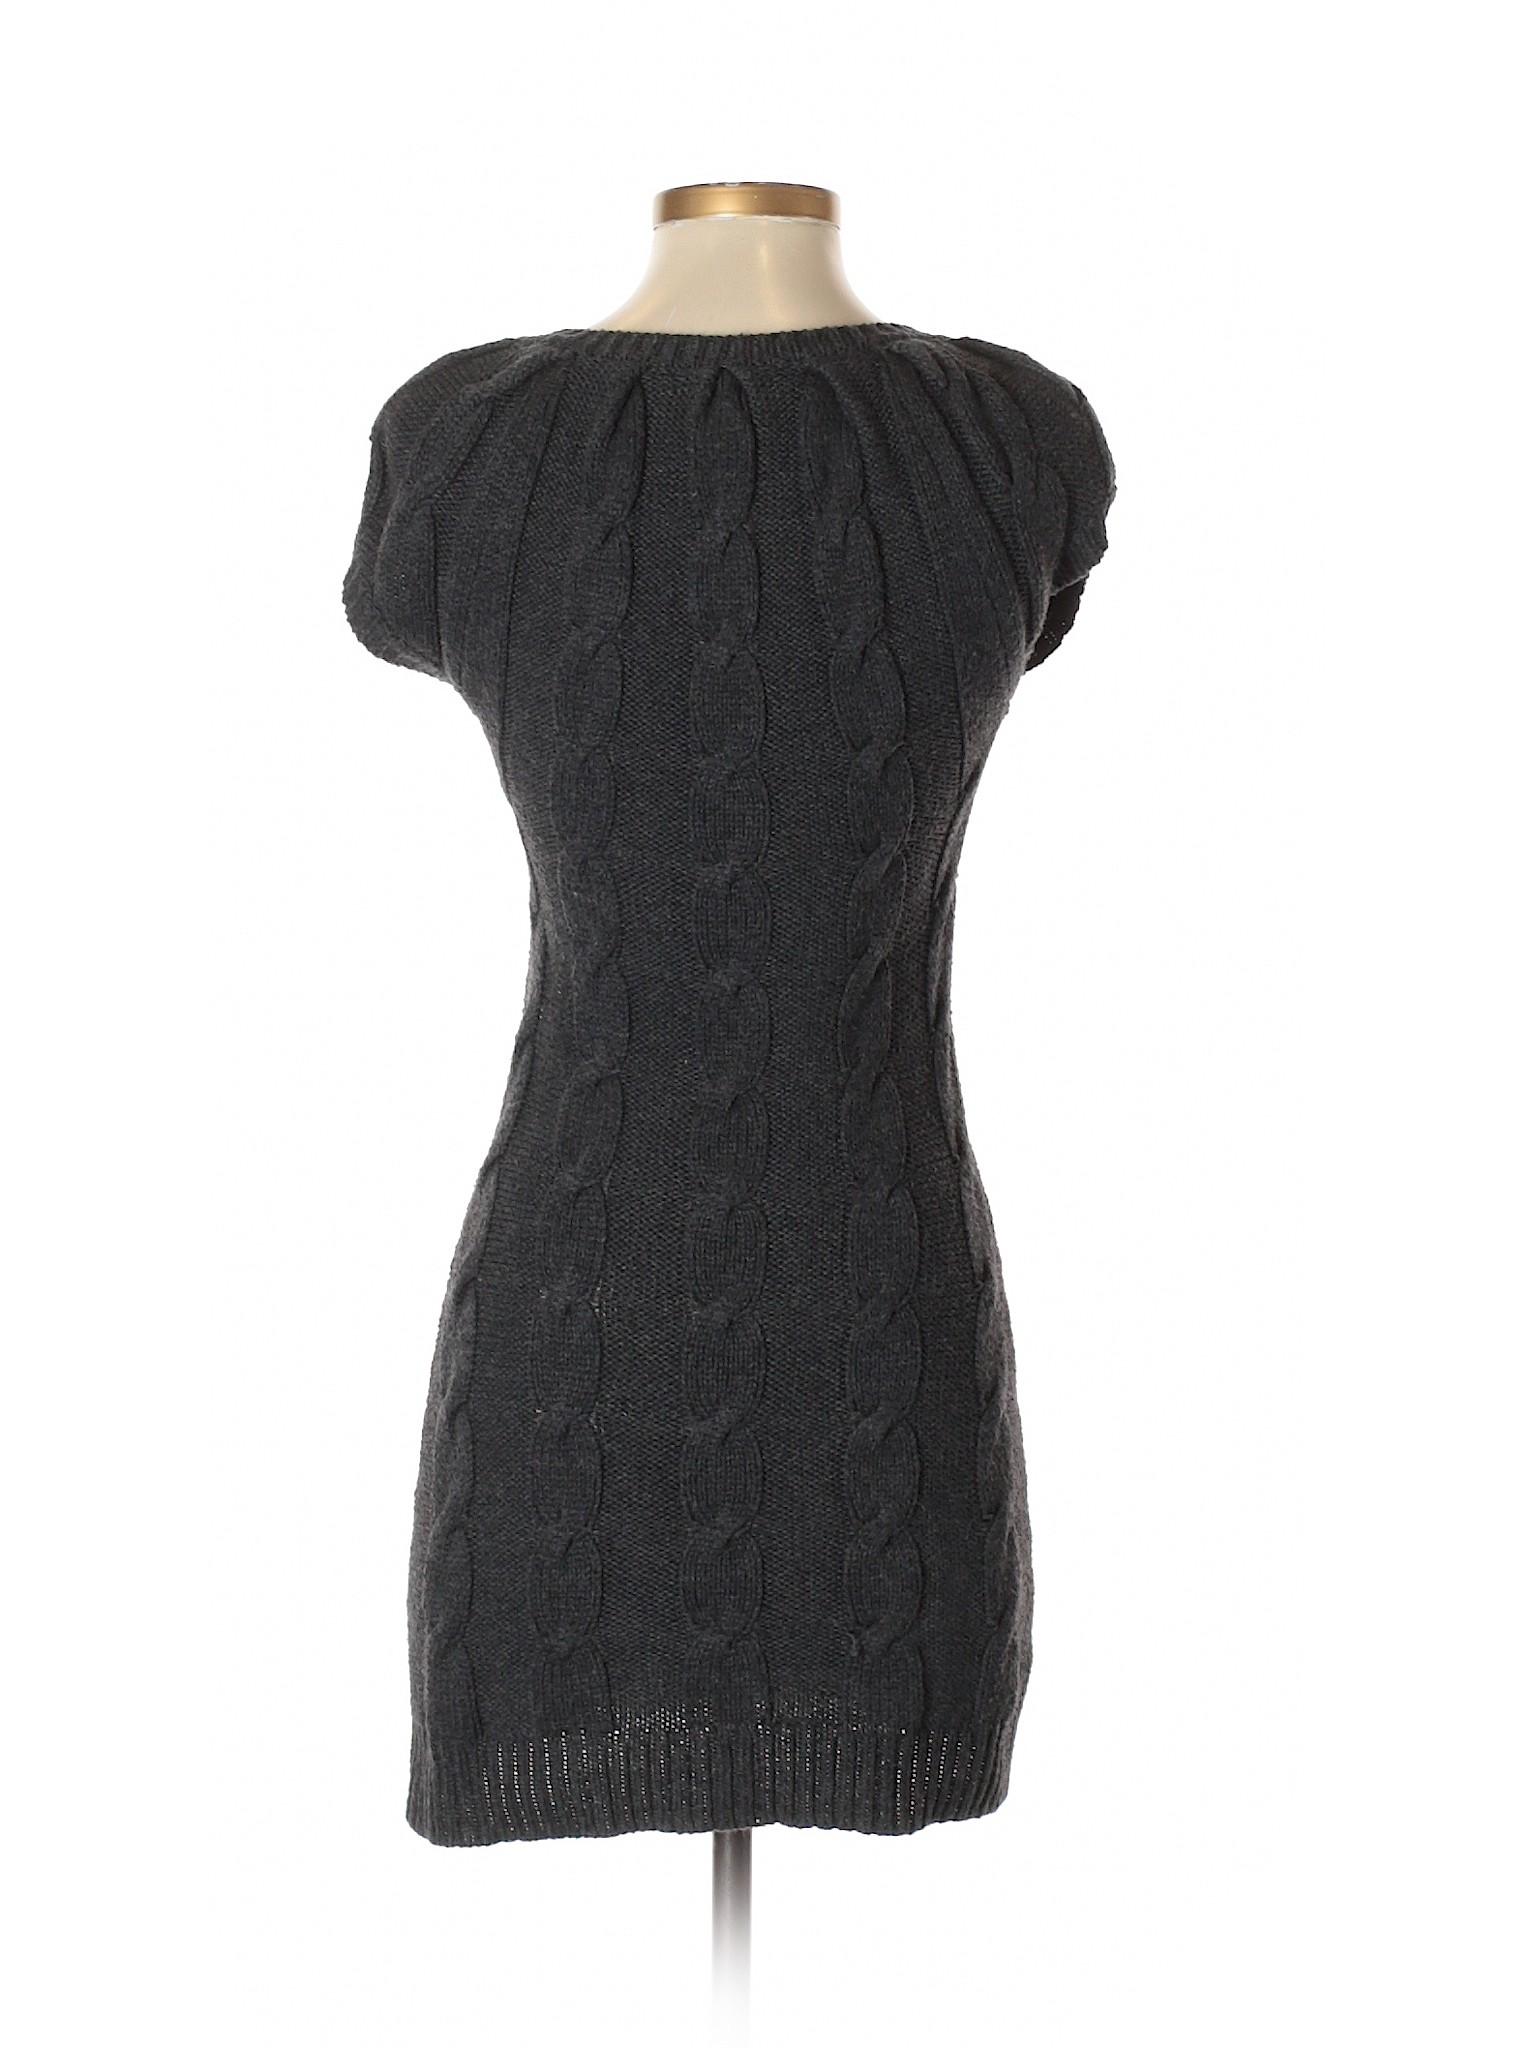 Dress Casual INC Concepts Selling International fx8Iw0nB